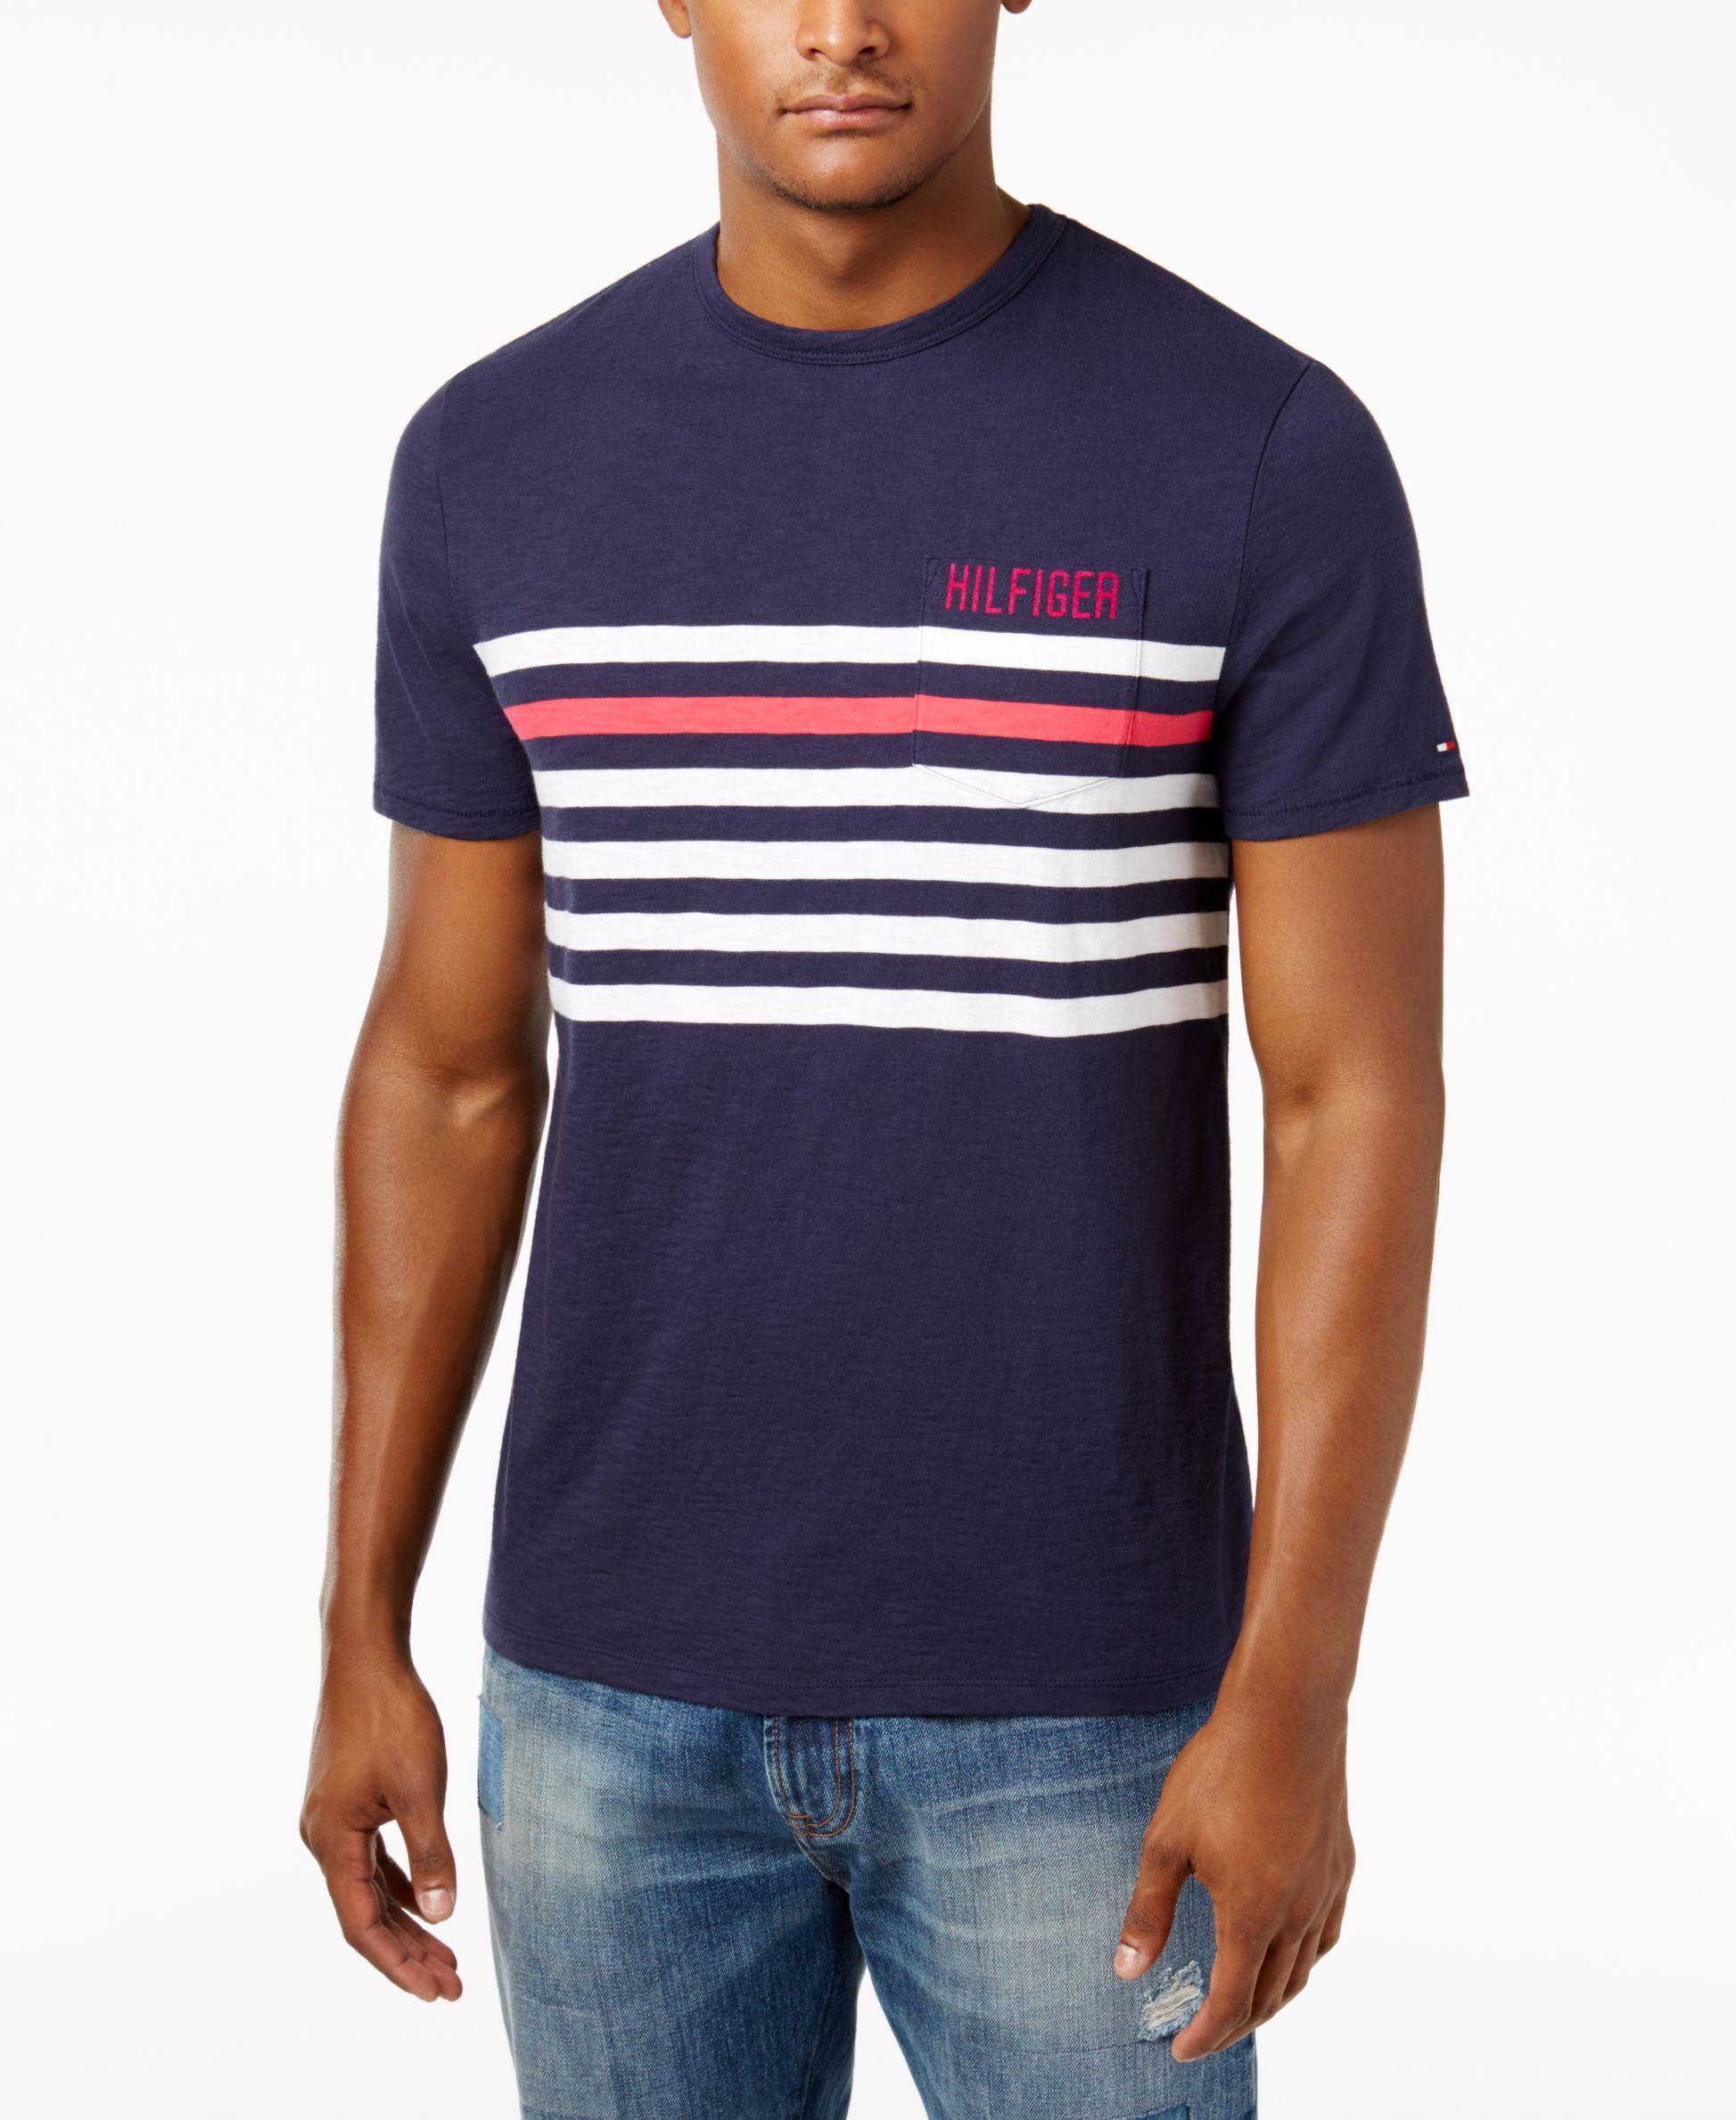 559354d901 Tommy Hilfiger Men's Striped T-Shirt | Products | Tommy hilfiger, T ...